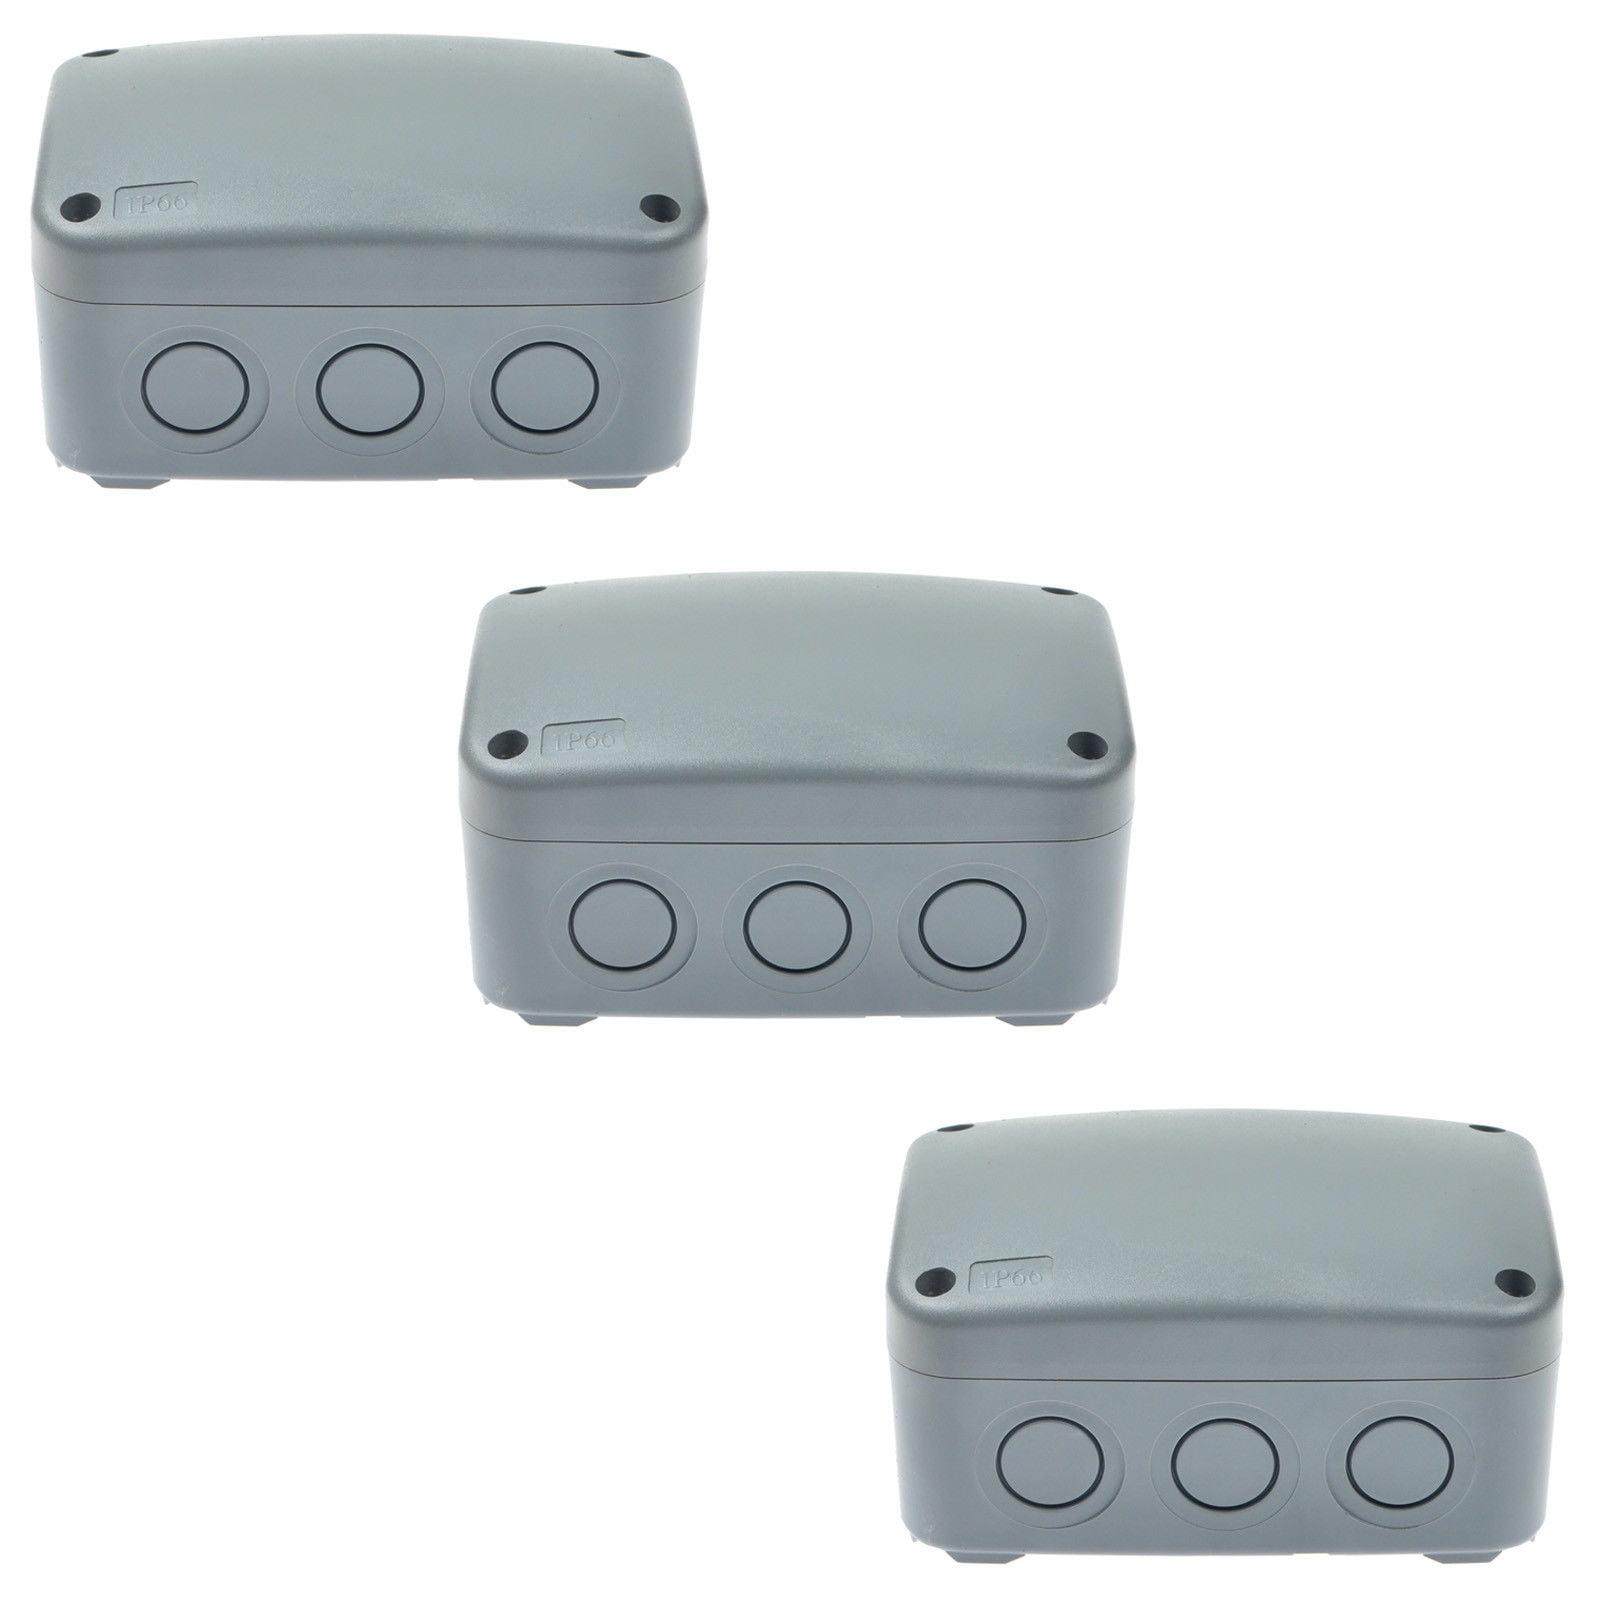 4 Packs IP66 Waterproof Enclosure Cable Case Power Junction Box 125 × 86 × 62mm